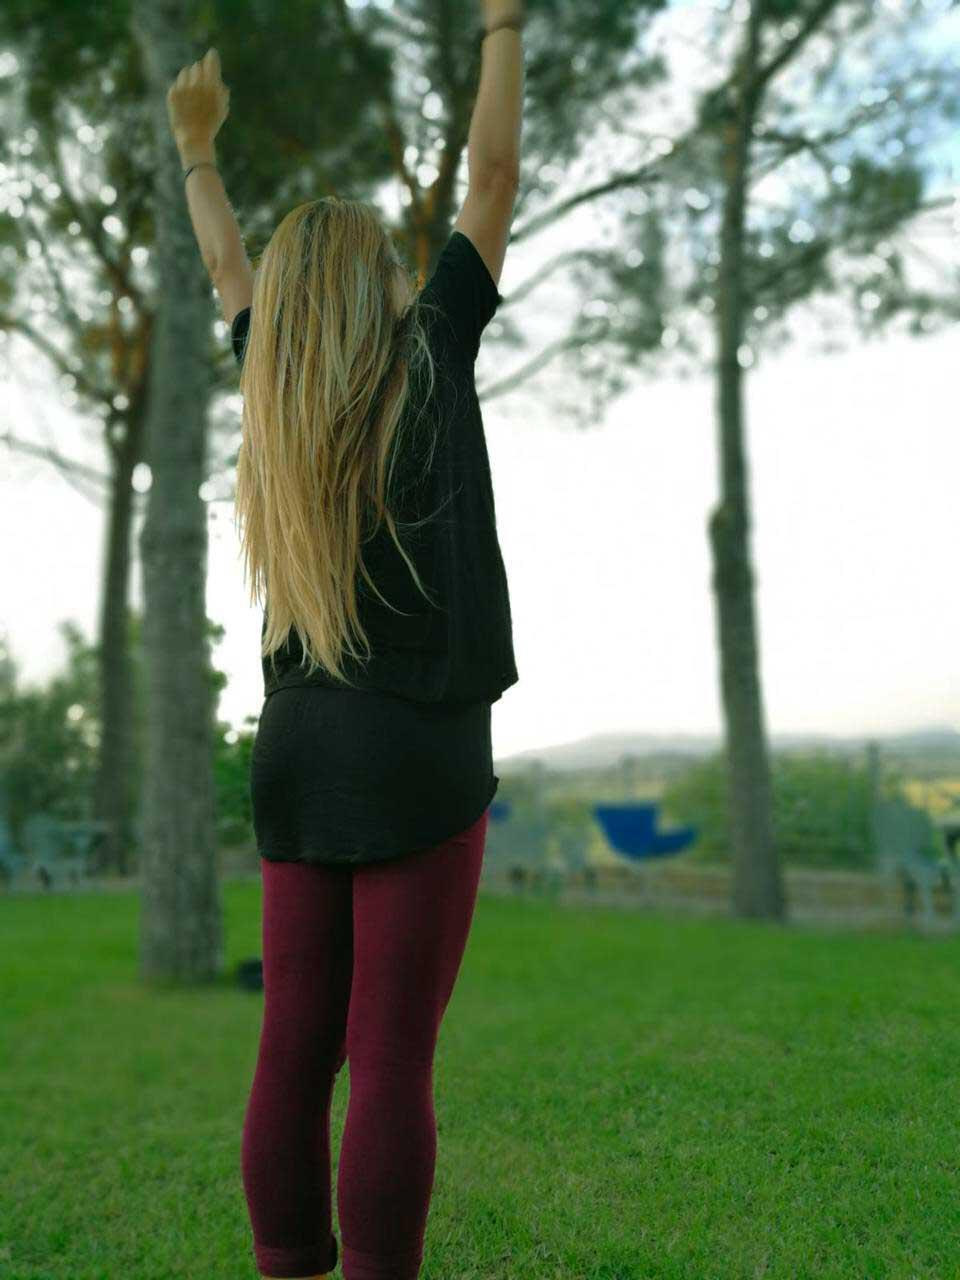 Equilibrio corpo mente emozioni: balance body mind emotions